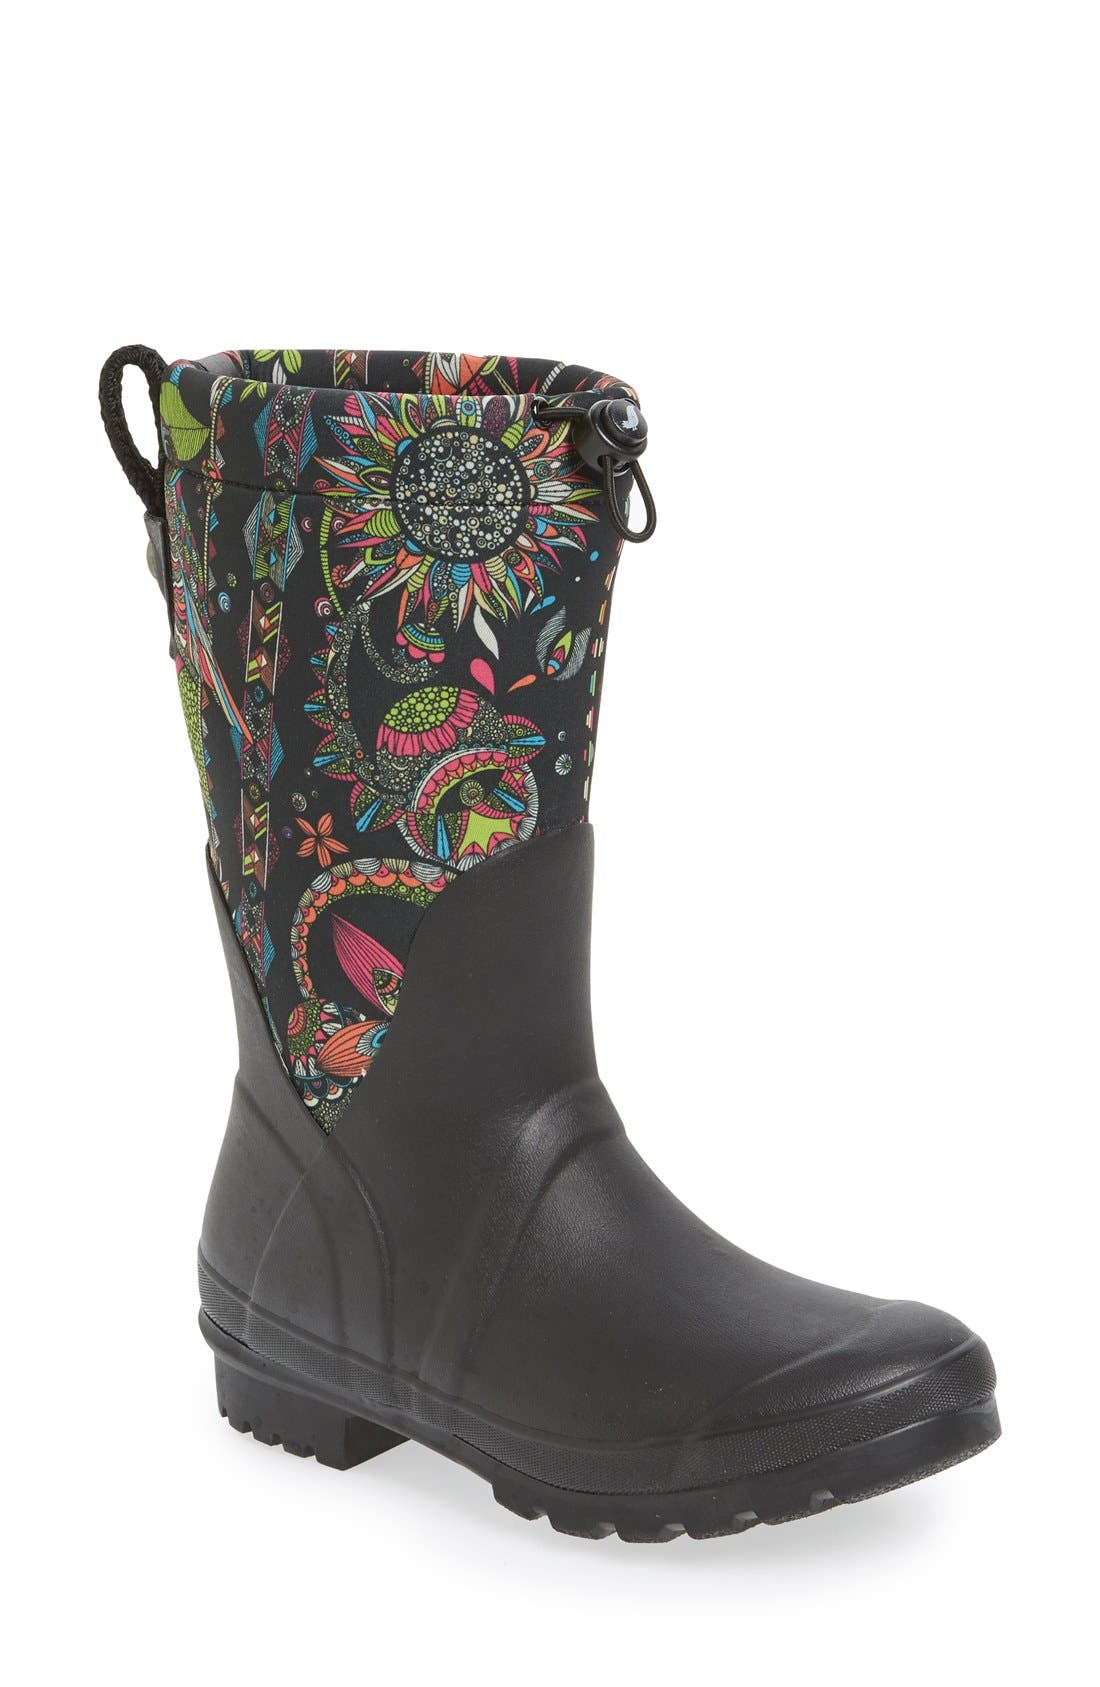 'Mezzo' Waterproof Rain Boot,                             Main thumbnail 1, color,                             003